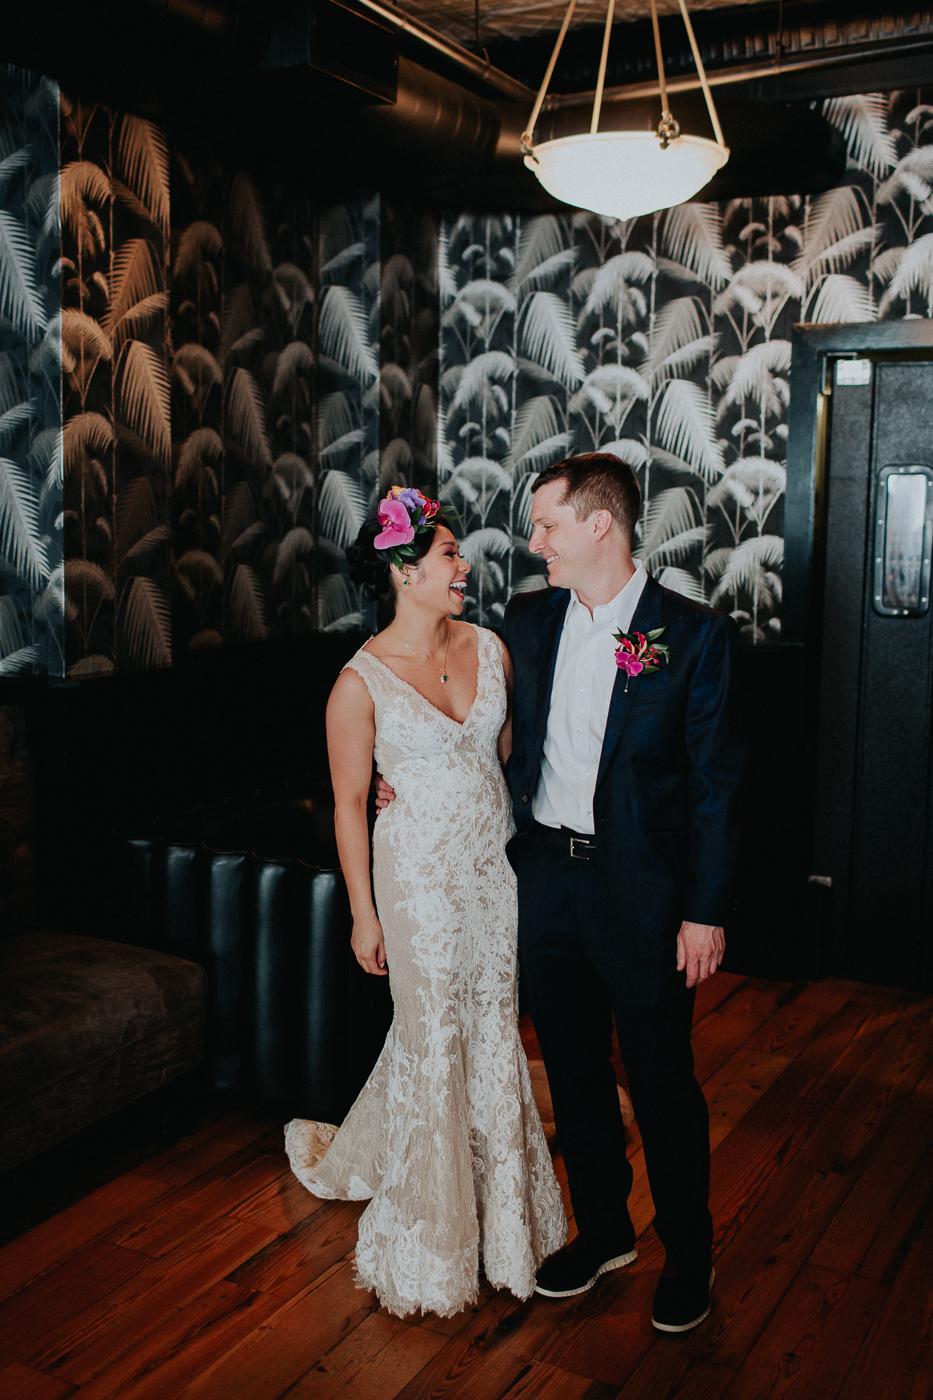 501-Union-Brooklyn-Documentary-Wedding-Photographer-21.jpg